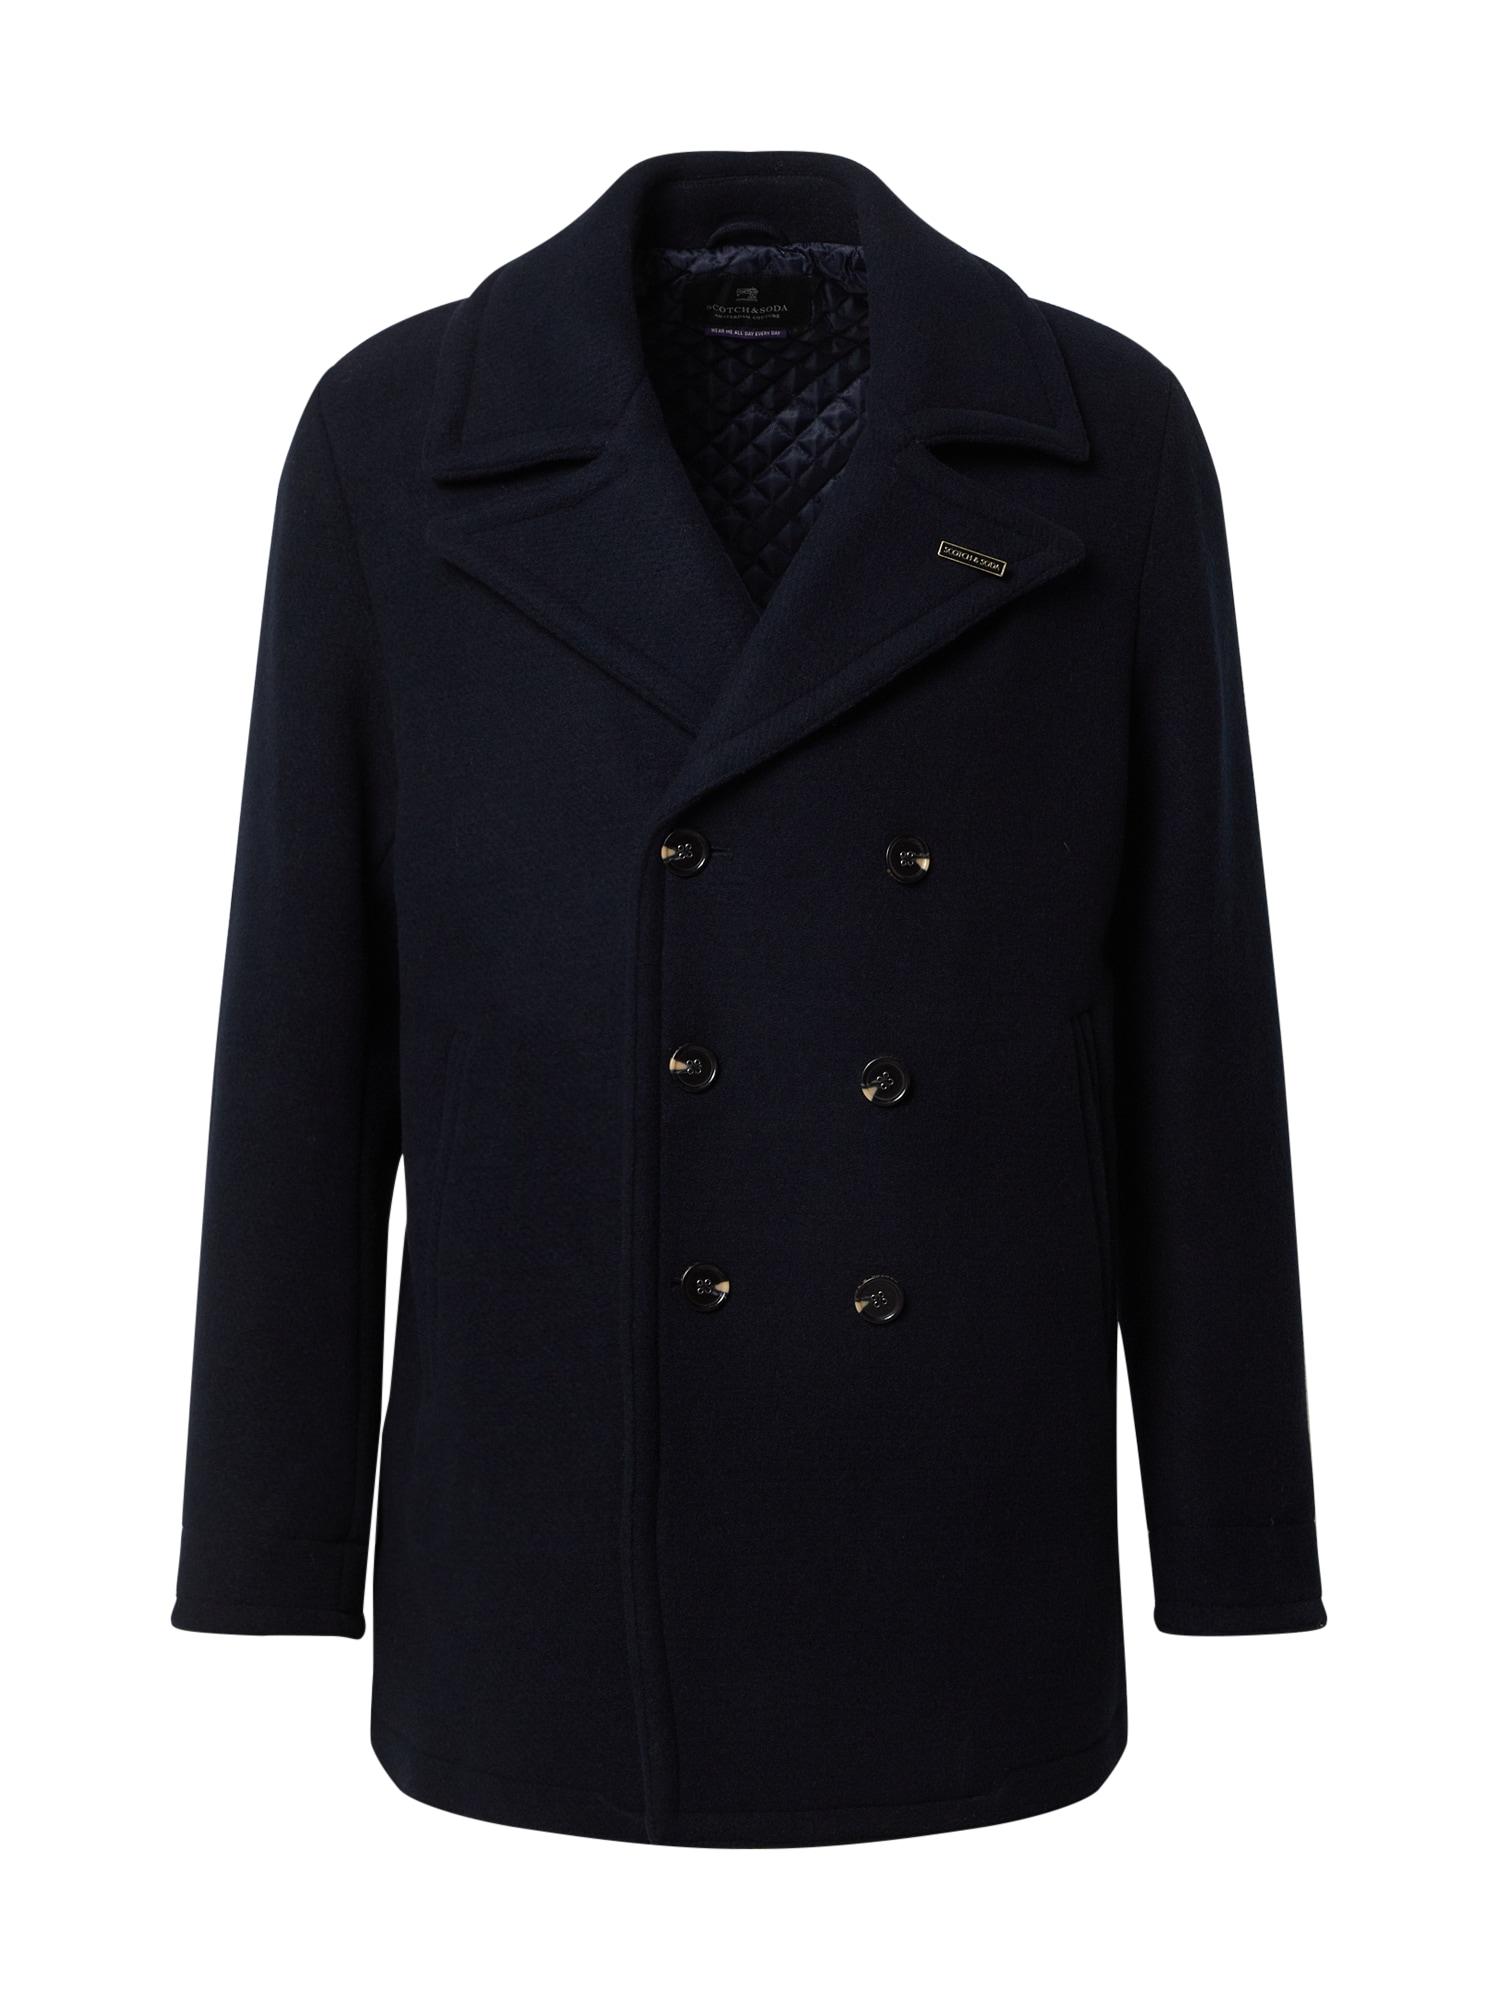 SCOTCH & SODA Demisezoninis paltas tamsiai mėlyna